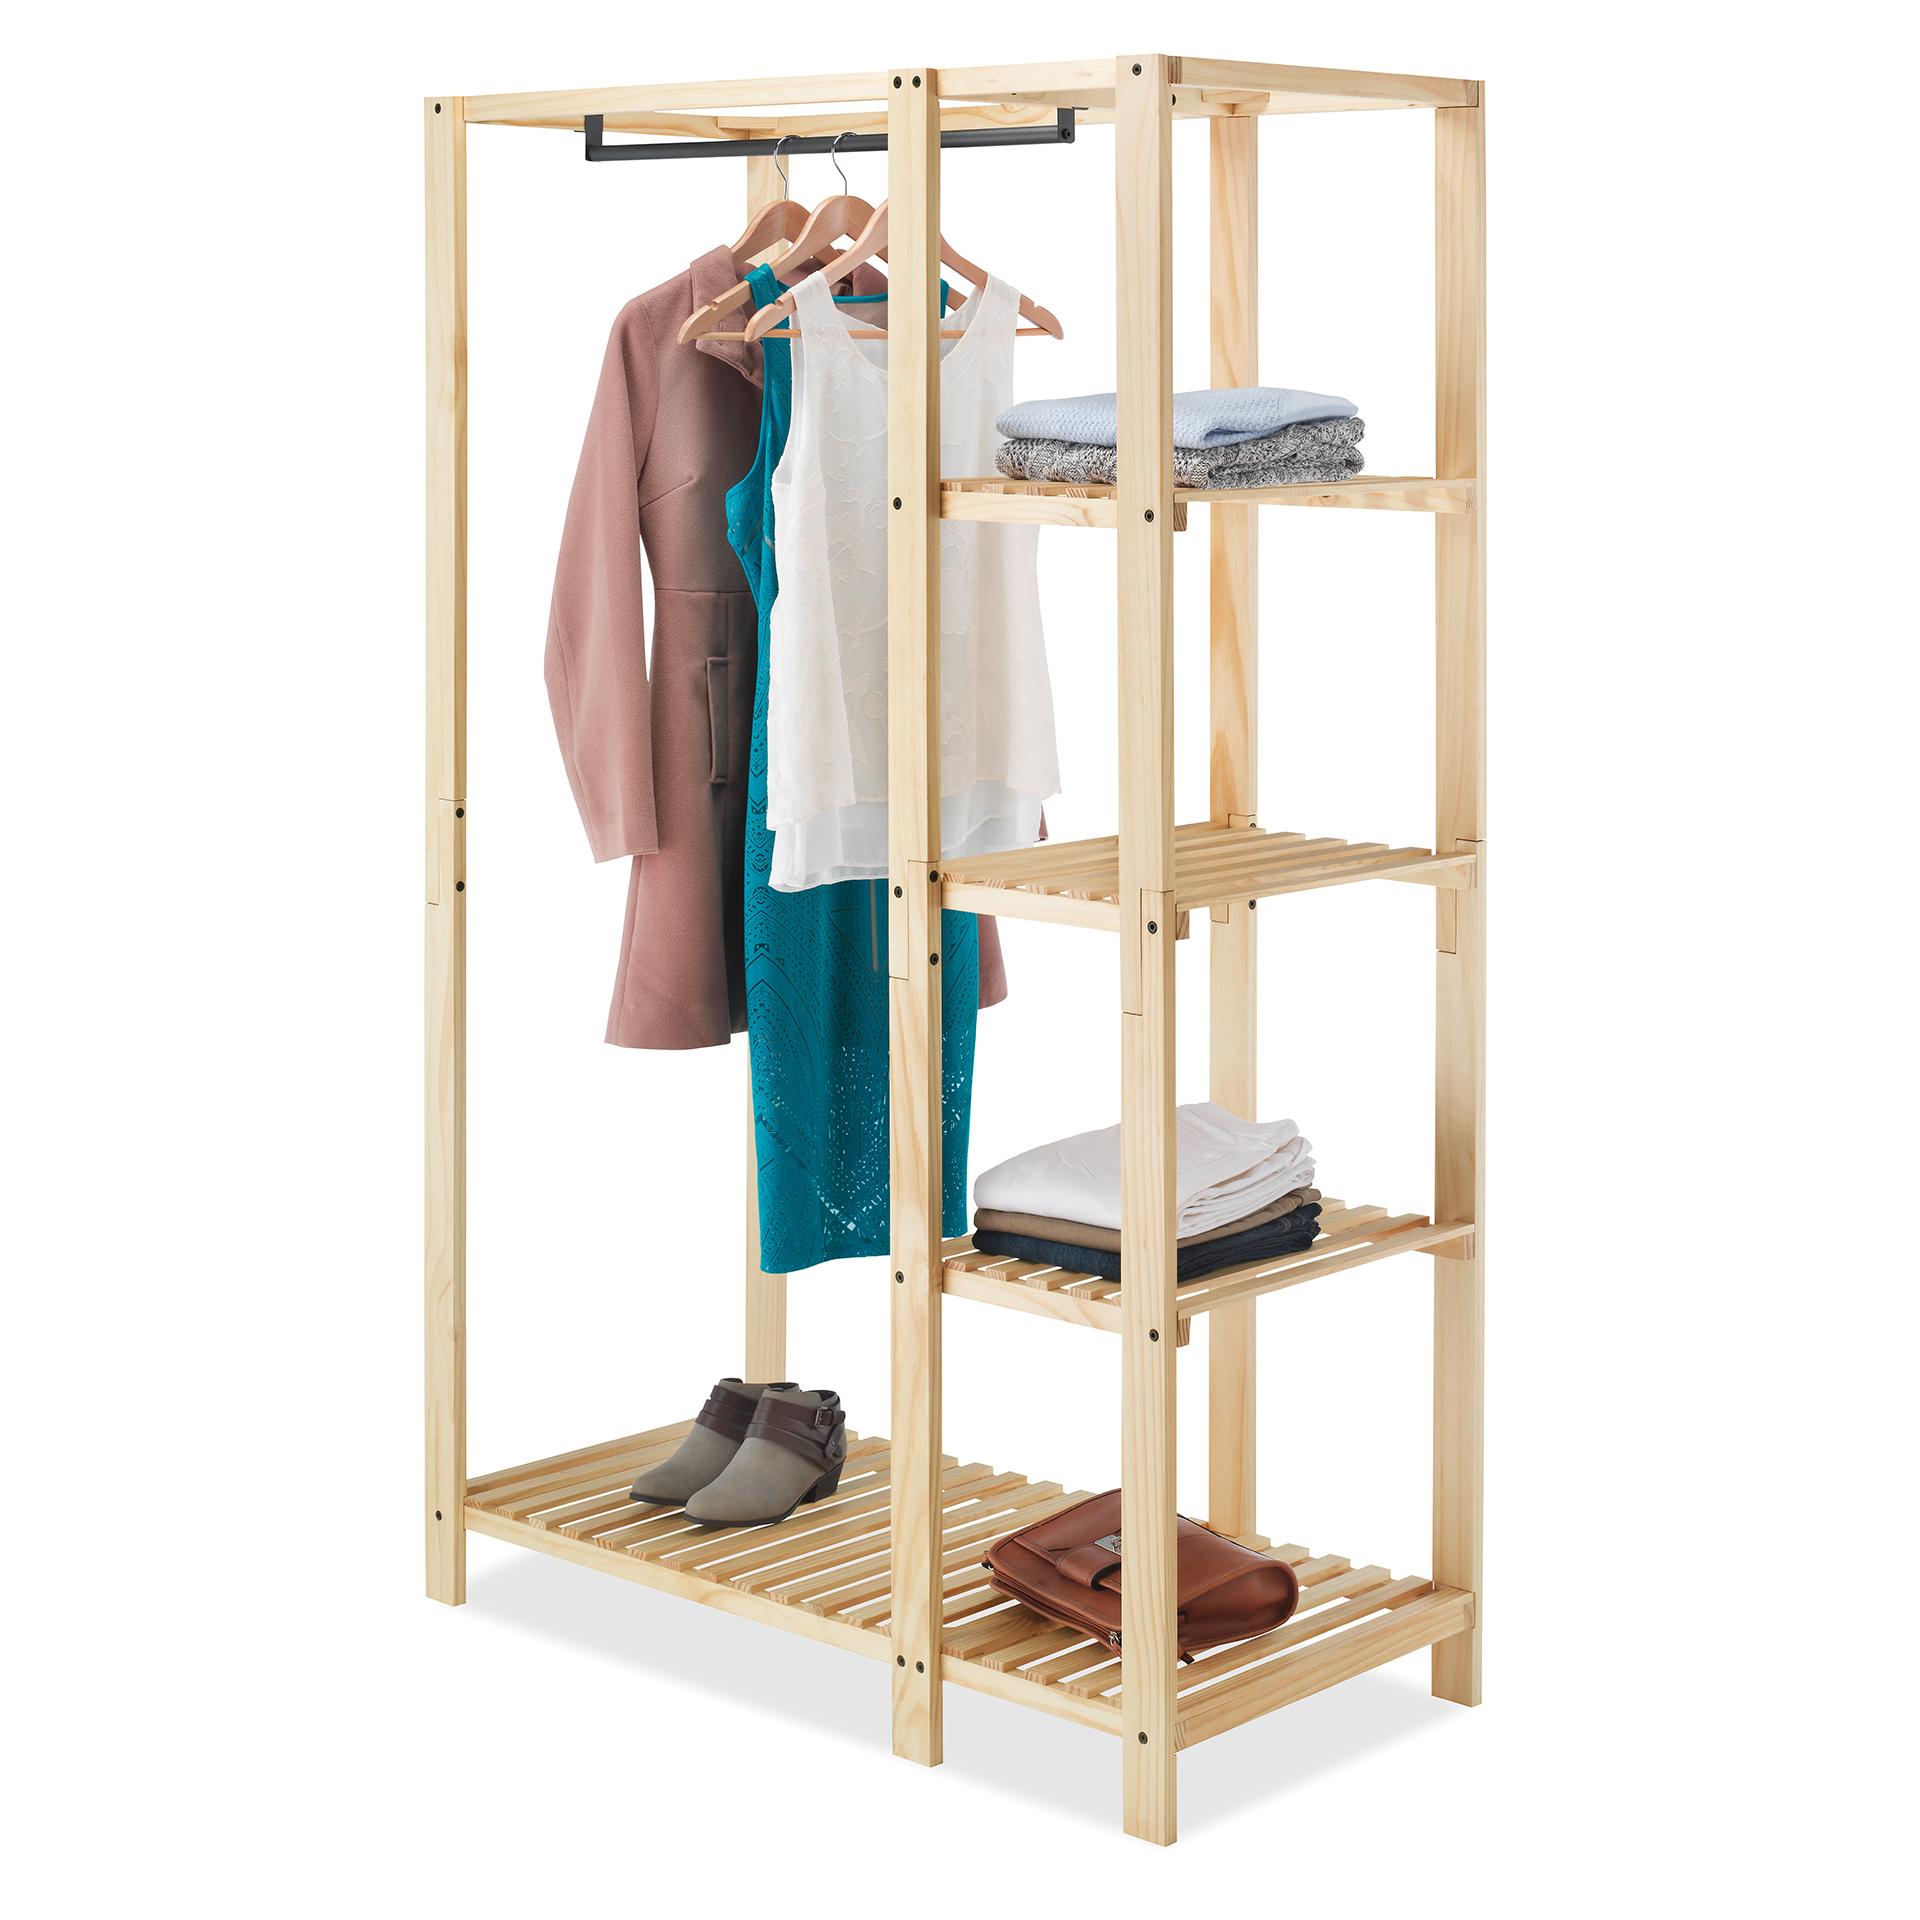 "Whitmor 6301-5244 20.13"" X 44"" X 68"" Natural Colored Slat Wood Wardrobe"